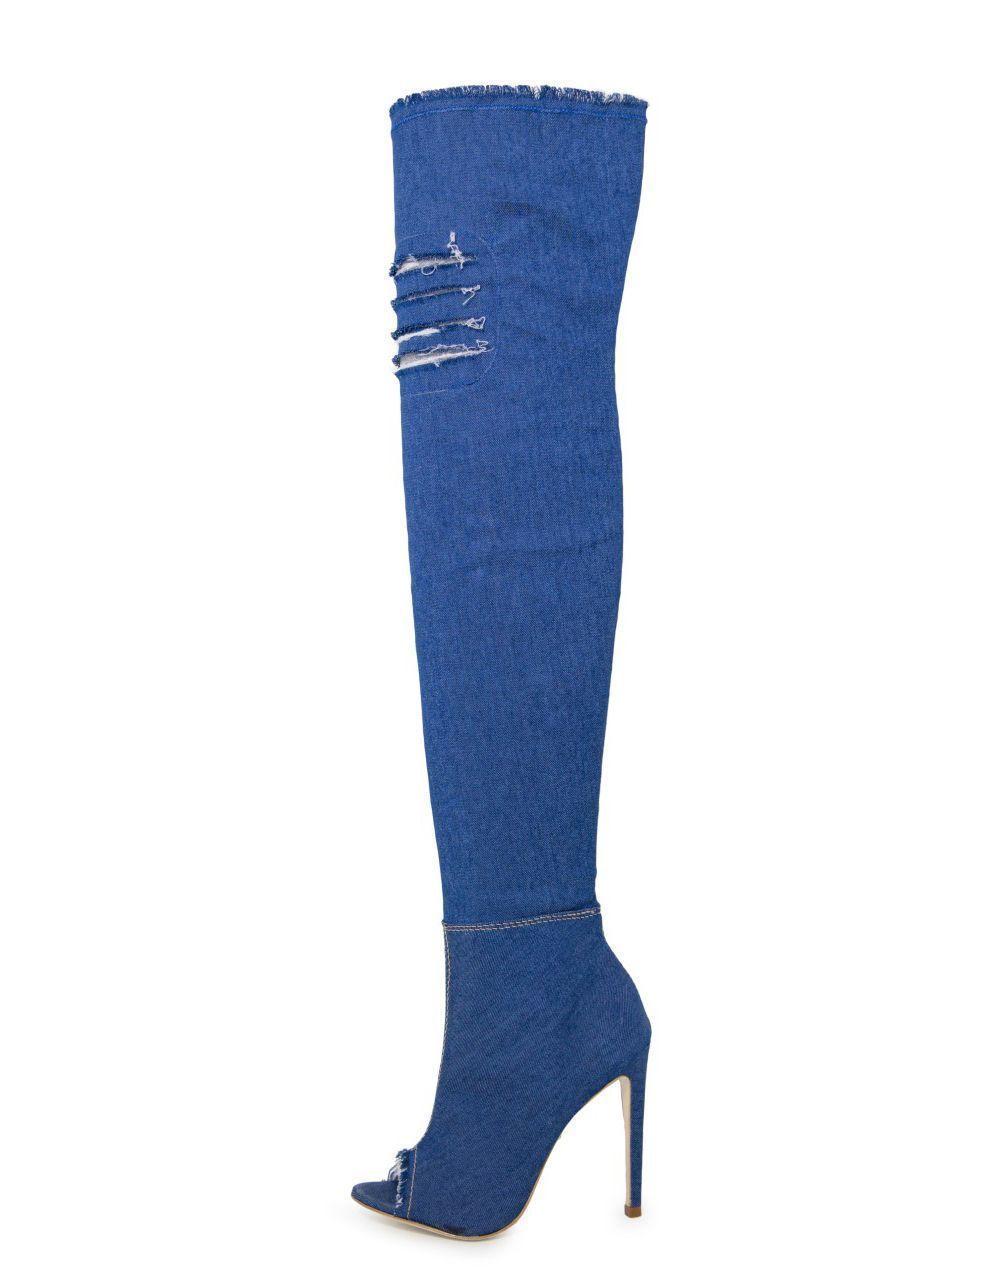 Bota Open boot Conceito Fashion Over The Knee Jeans Azul – Conceito Fashion